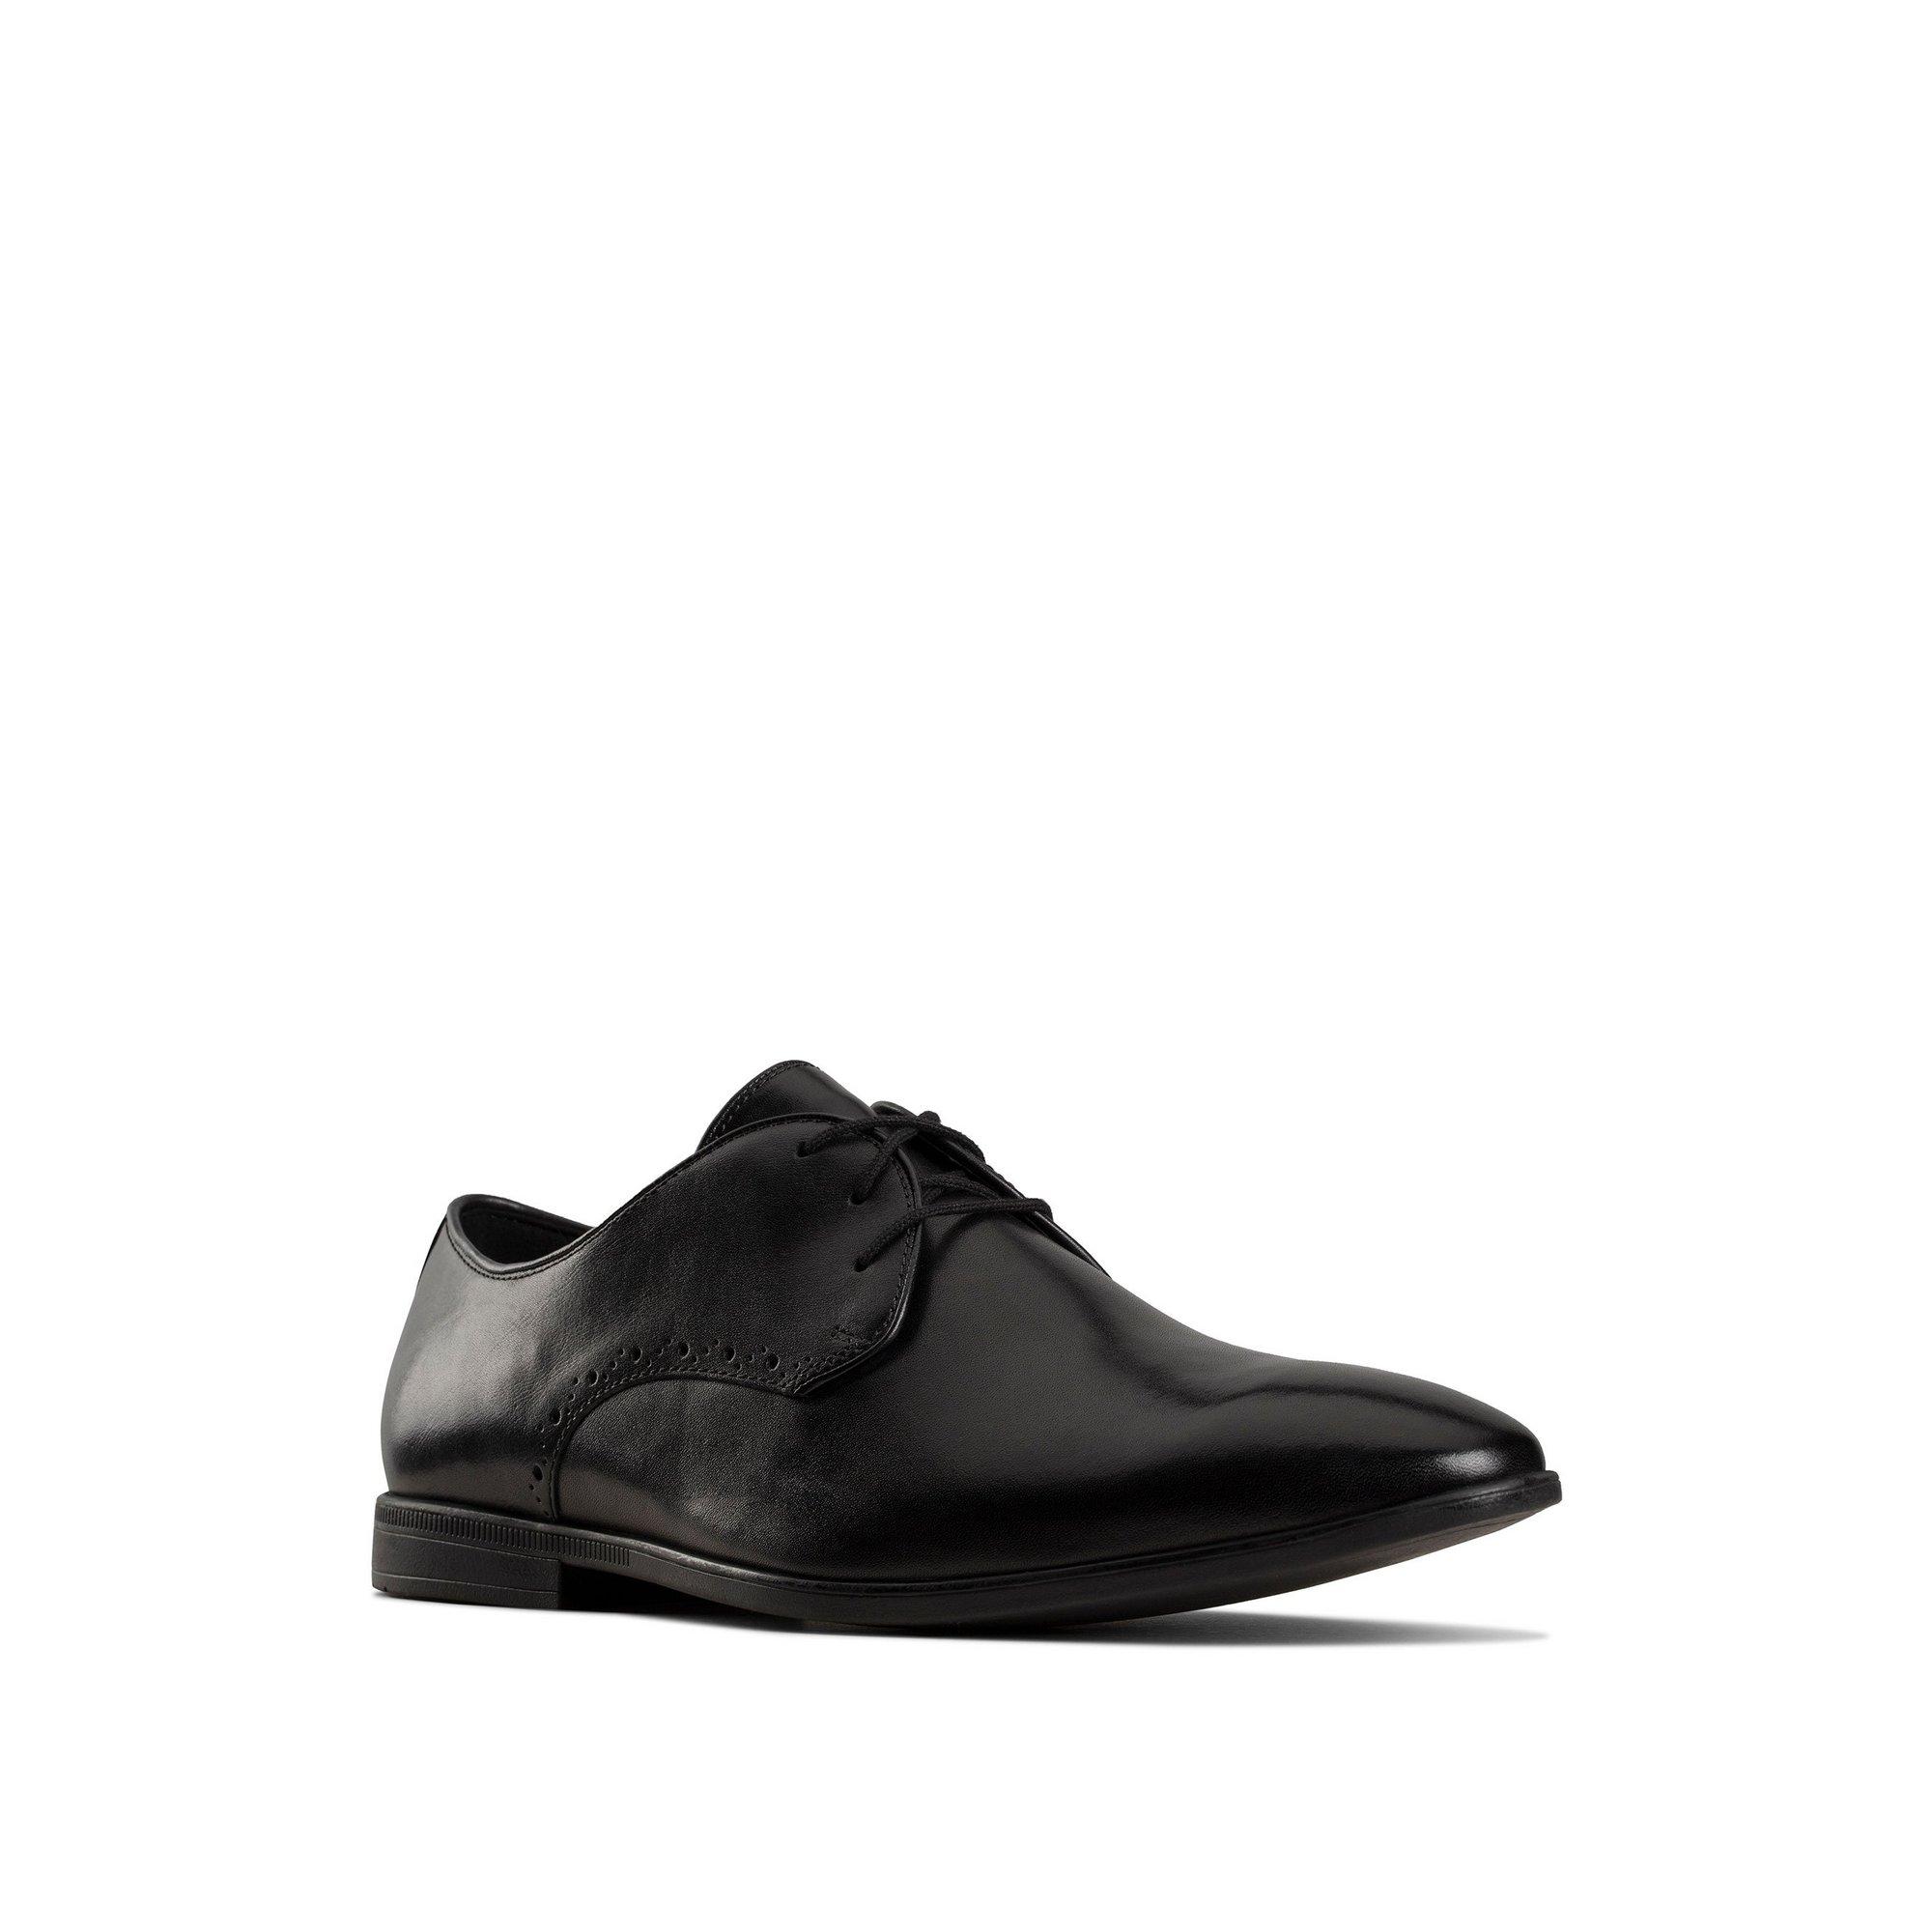 Image of Clarks Bampton Park Lace Up Black Derby Shoes